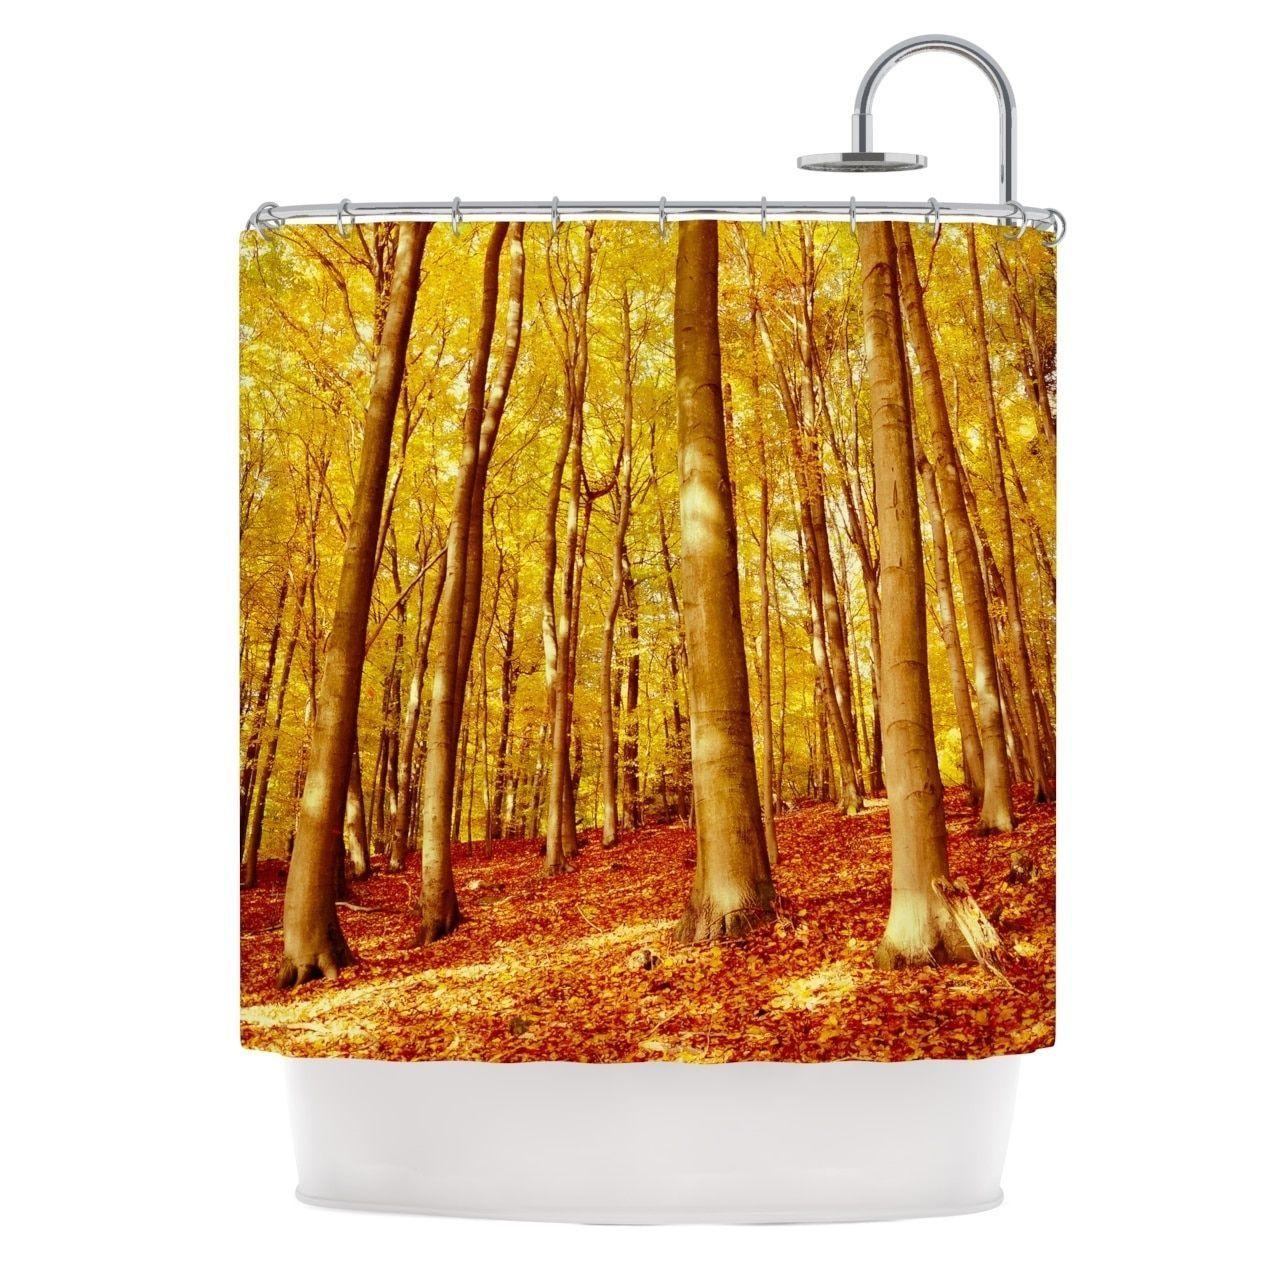 kess inhouse iris lehnhardt forest colors yellow orange shower  - kess inhouse iris lehnhardt forest colors yellow orange shower curtain(x) by kess inhouse